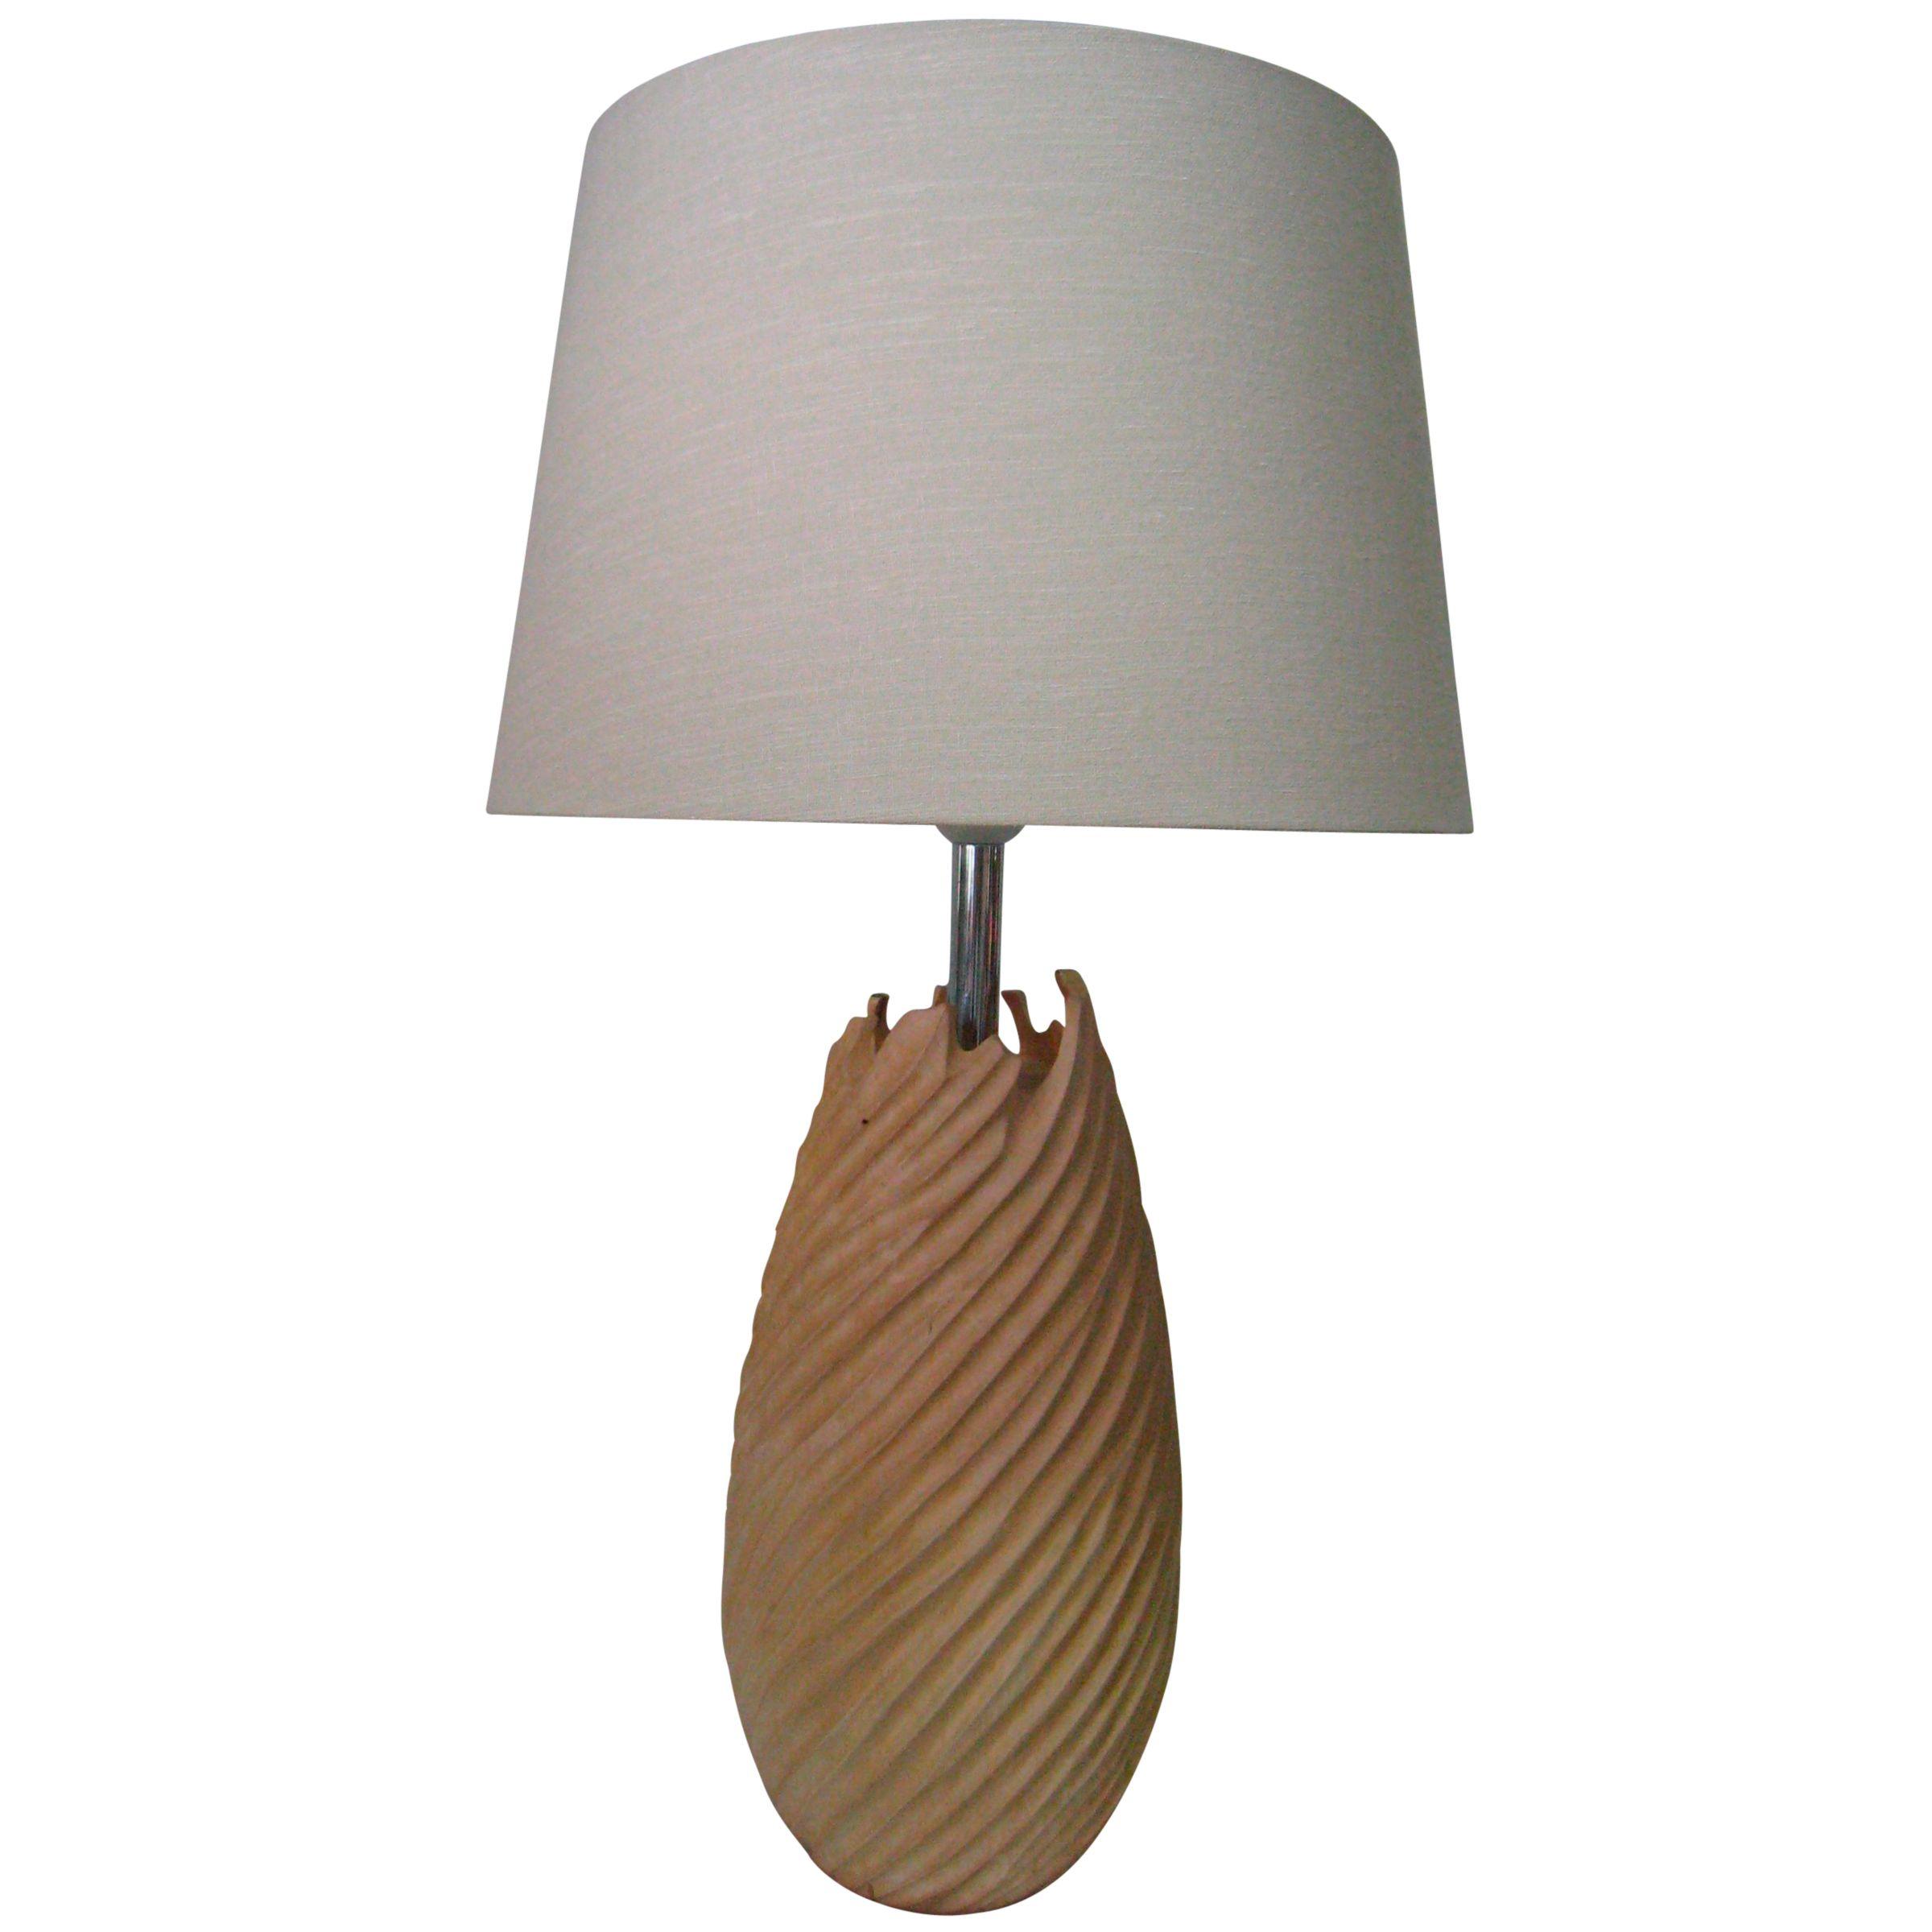 wood table lamps reviews. Black Bedroom Furniture Sets. Home Design Ideas